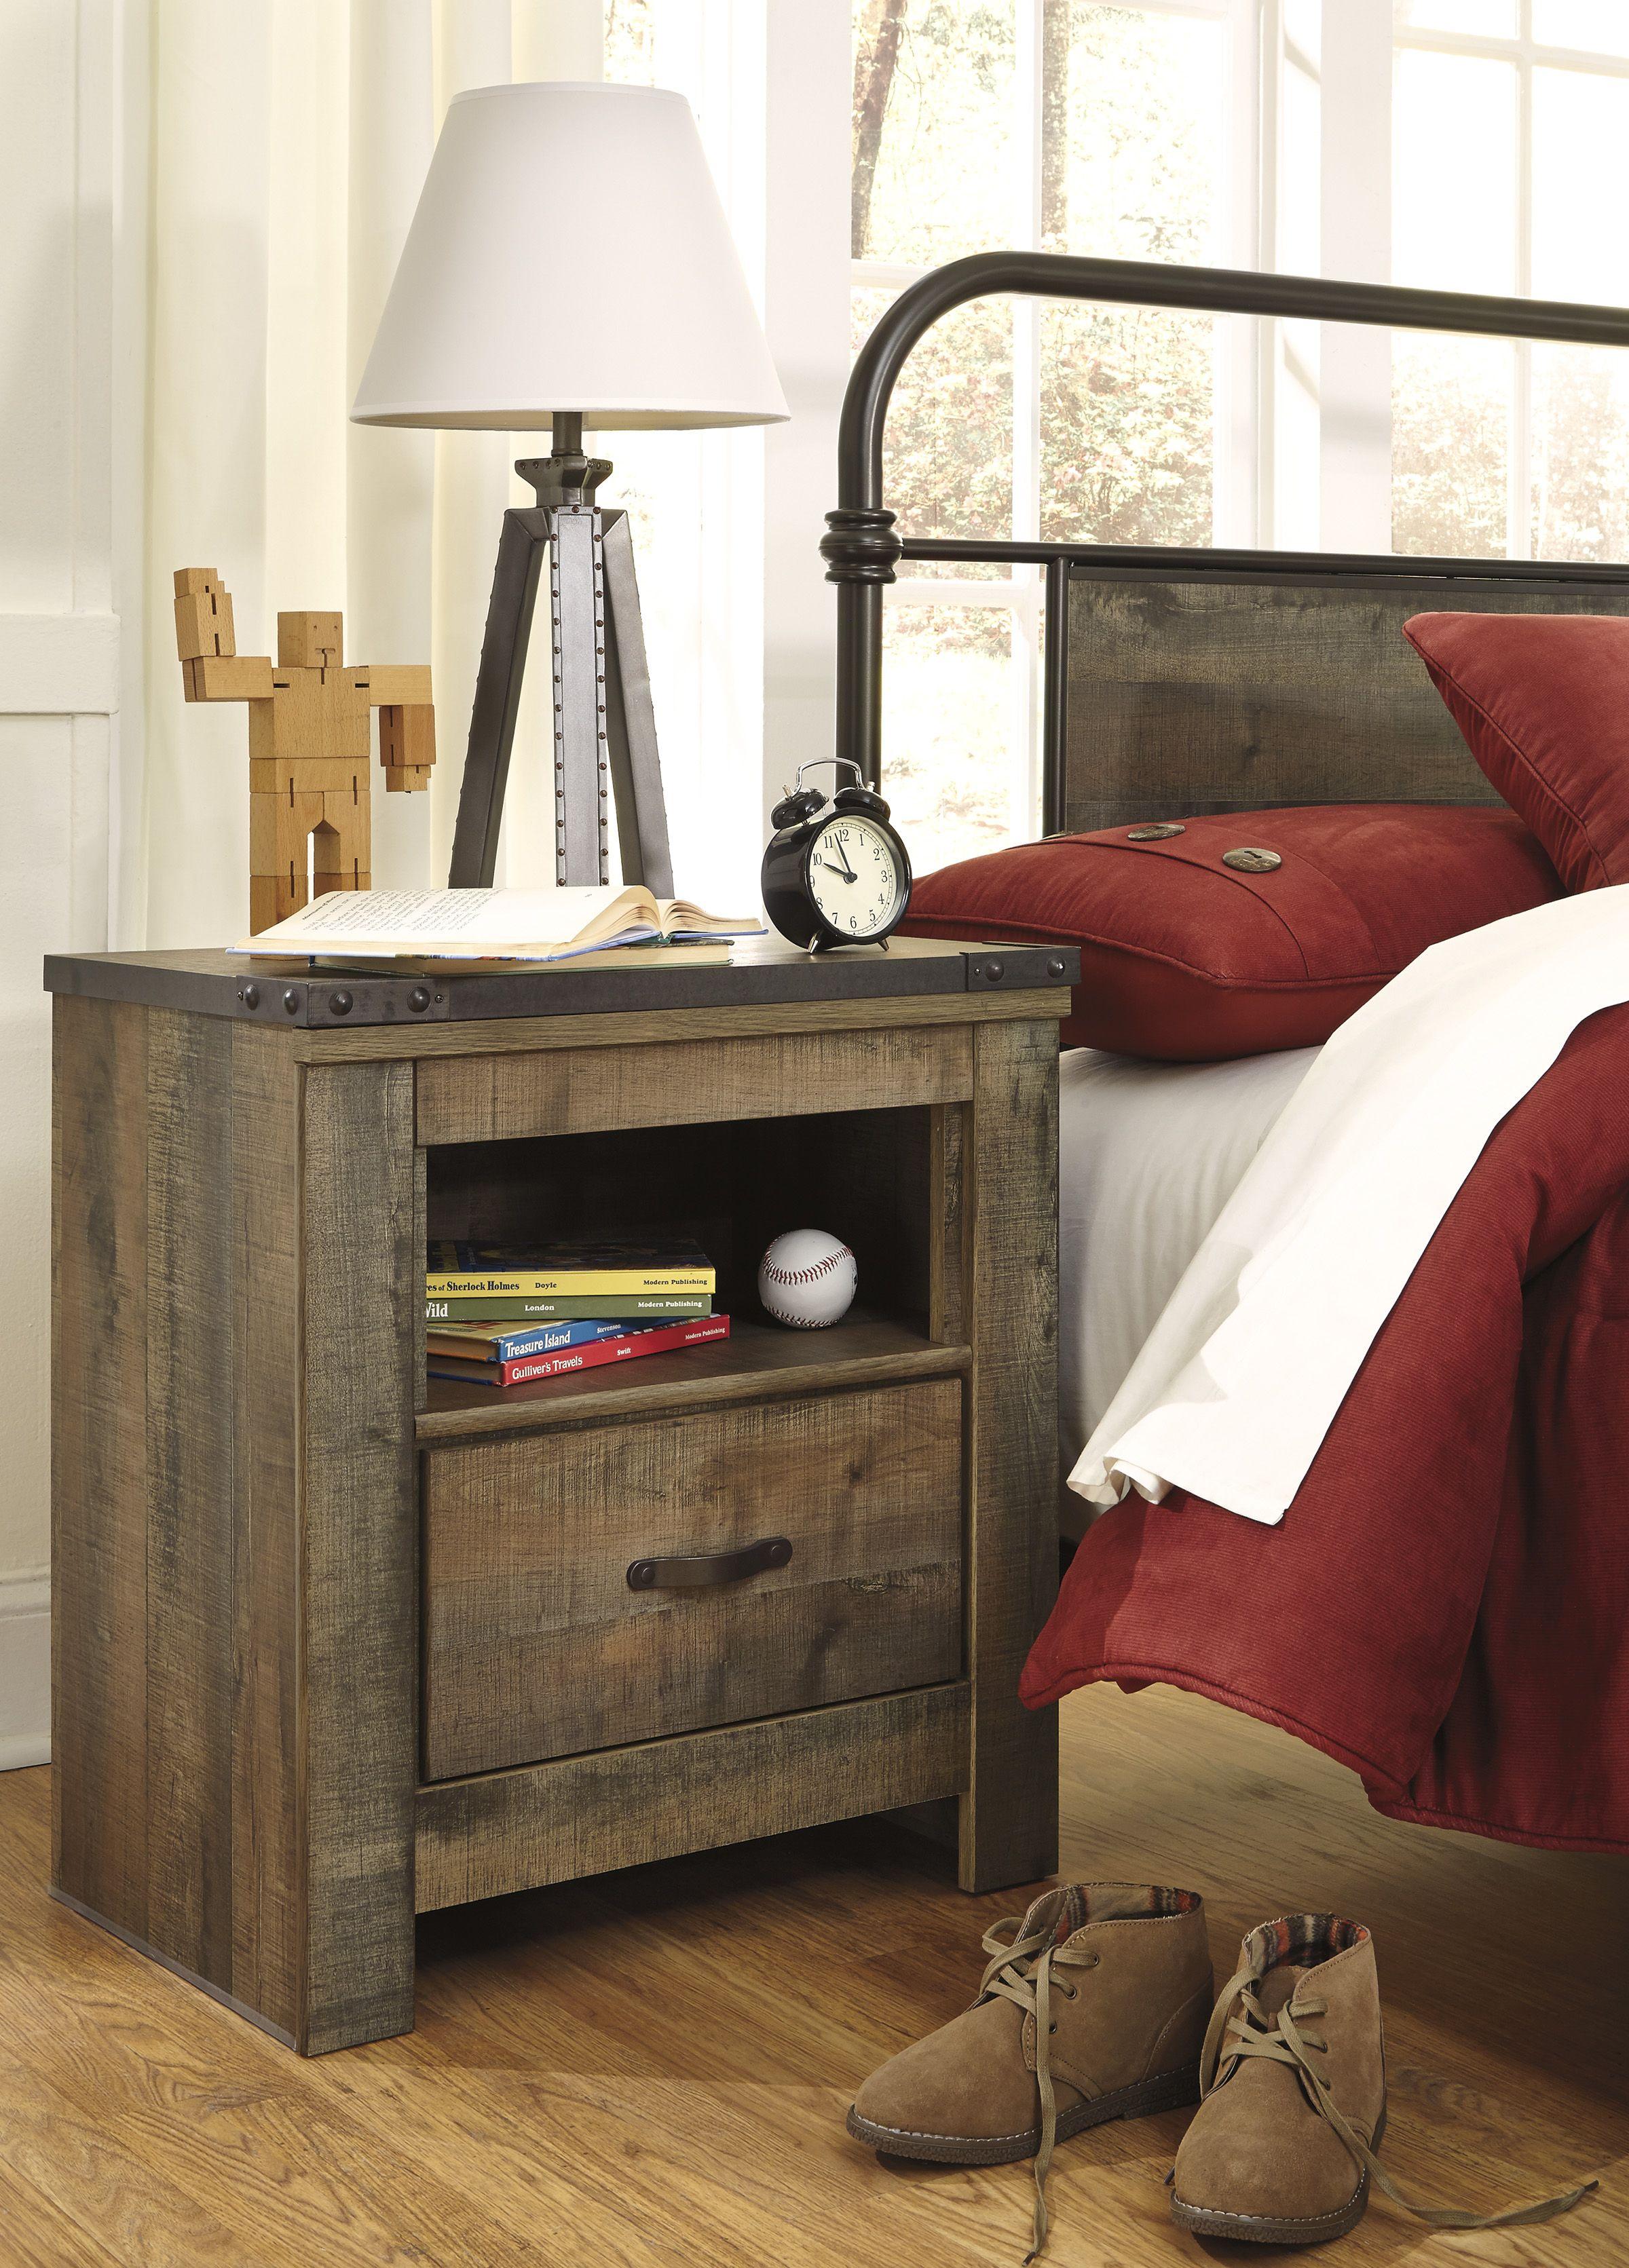 Trinell Nightstand Rustic nightstand, Bedroom night